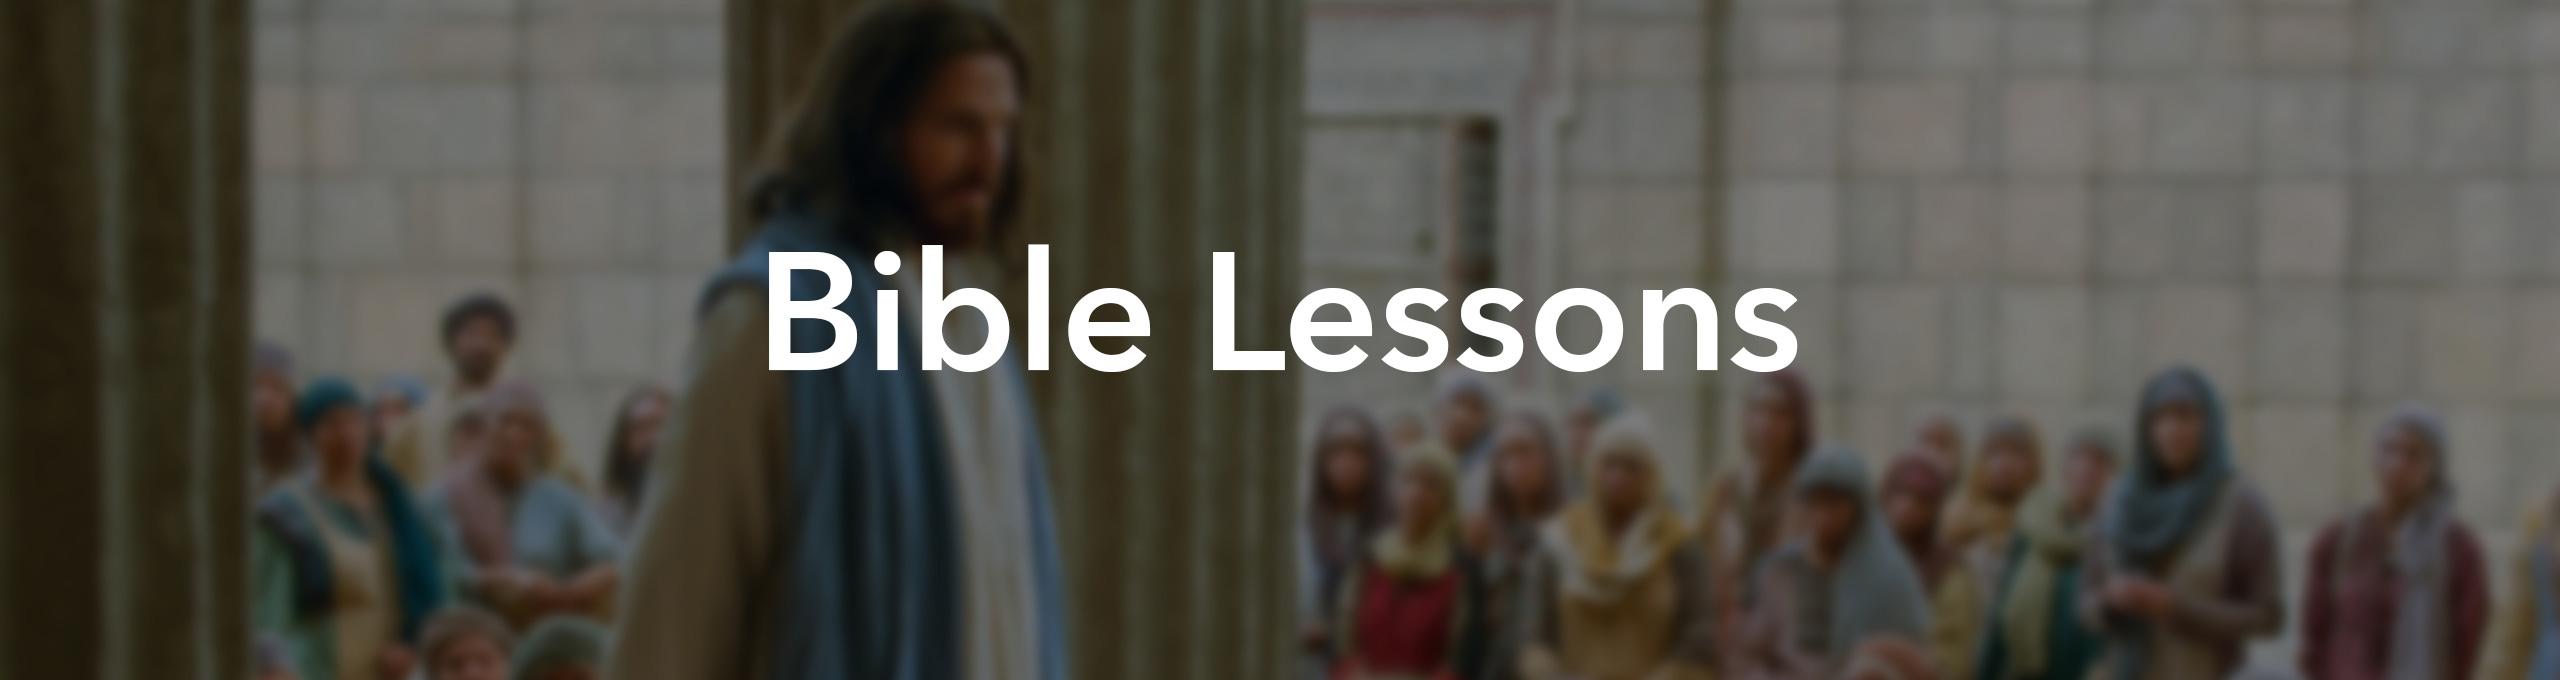 Workbooks christian workbooks for women : Bible Lessons — Calvary Chapel Golden Springs Calvary Chapel ...